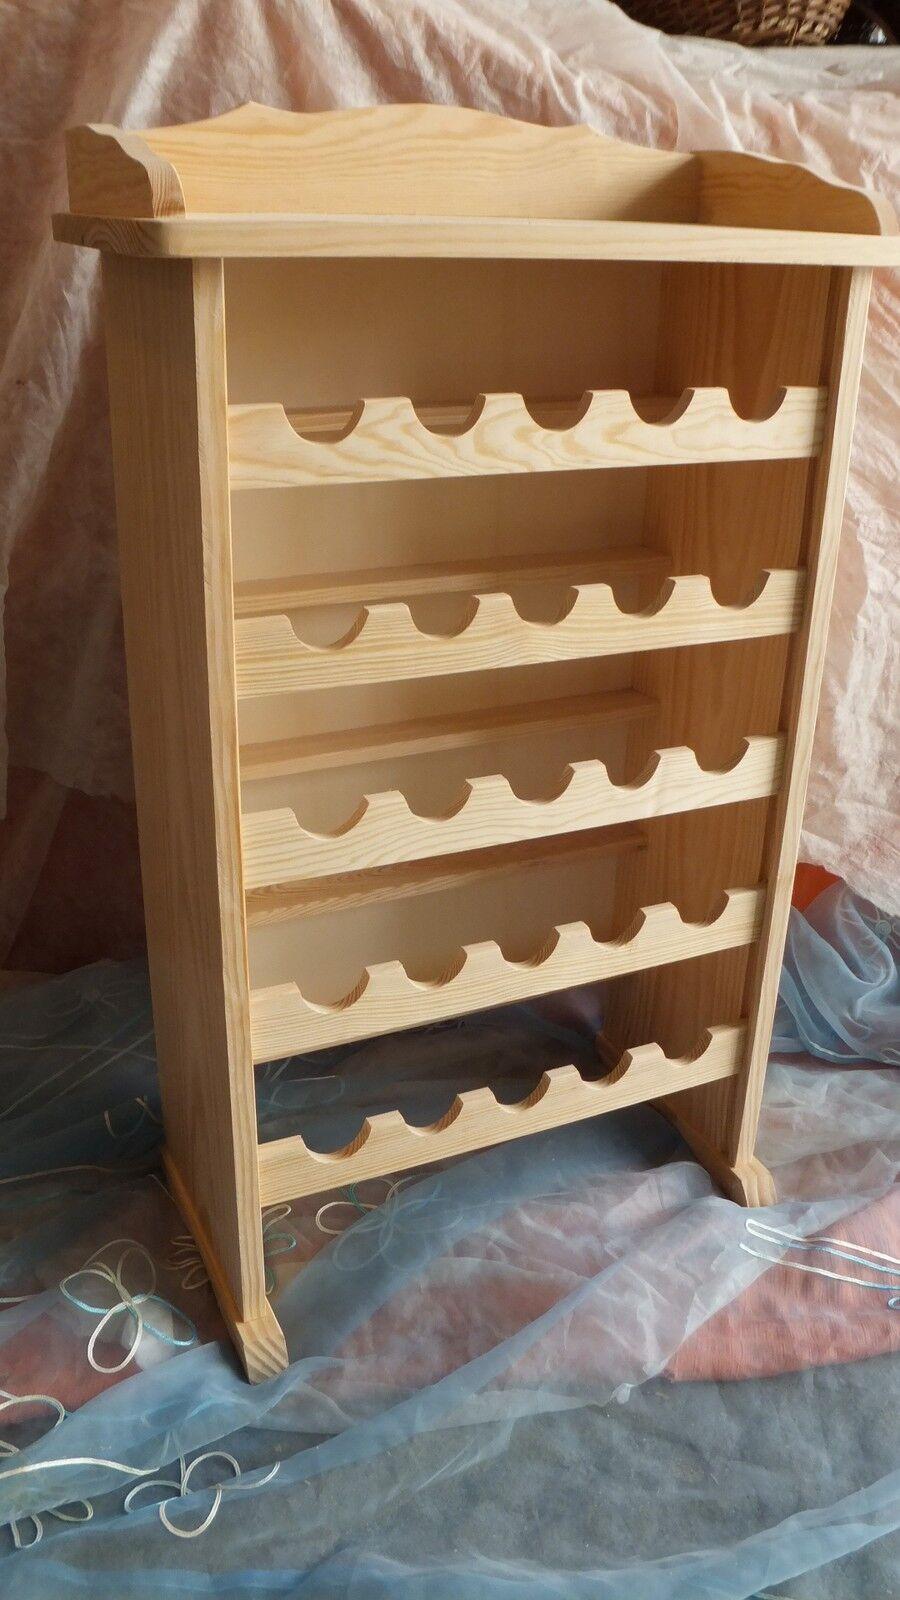 Mueble BOTELLERO de madera maciza, 90 cms. alto